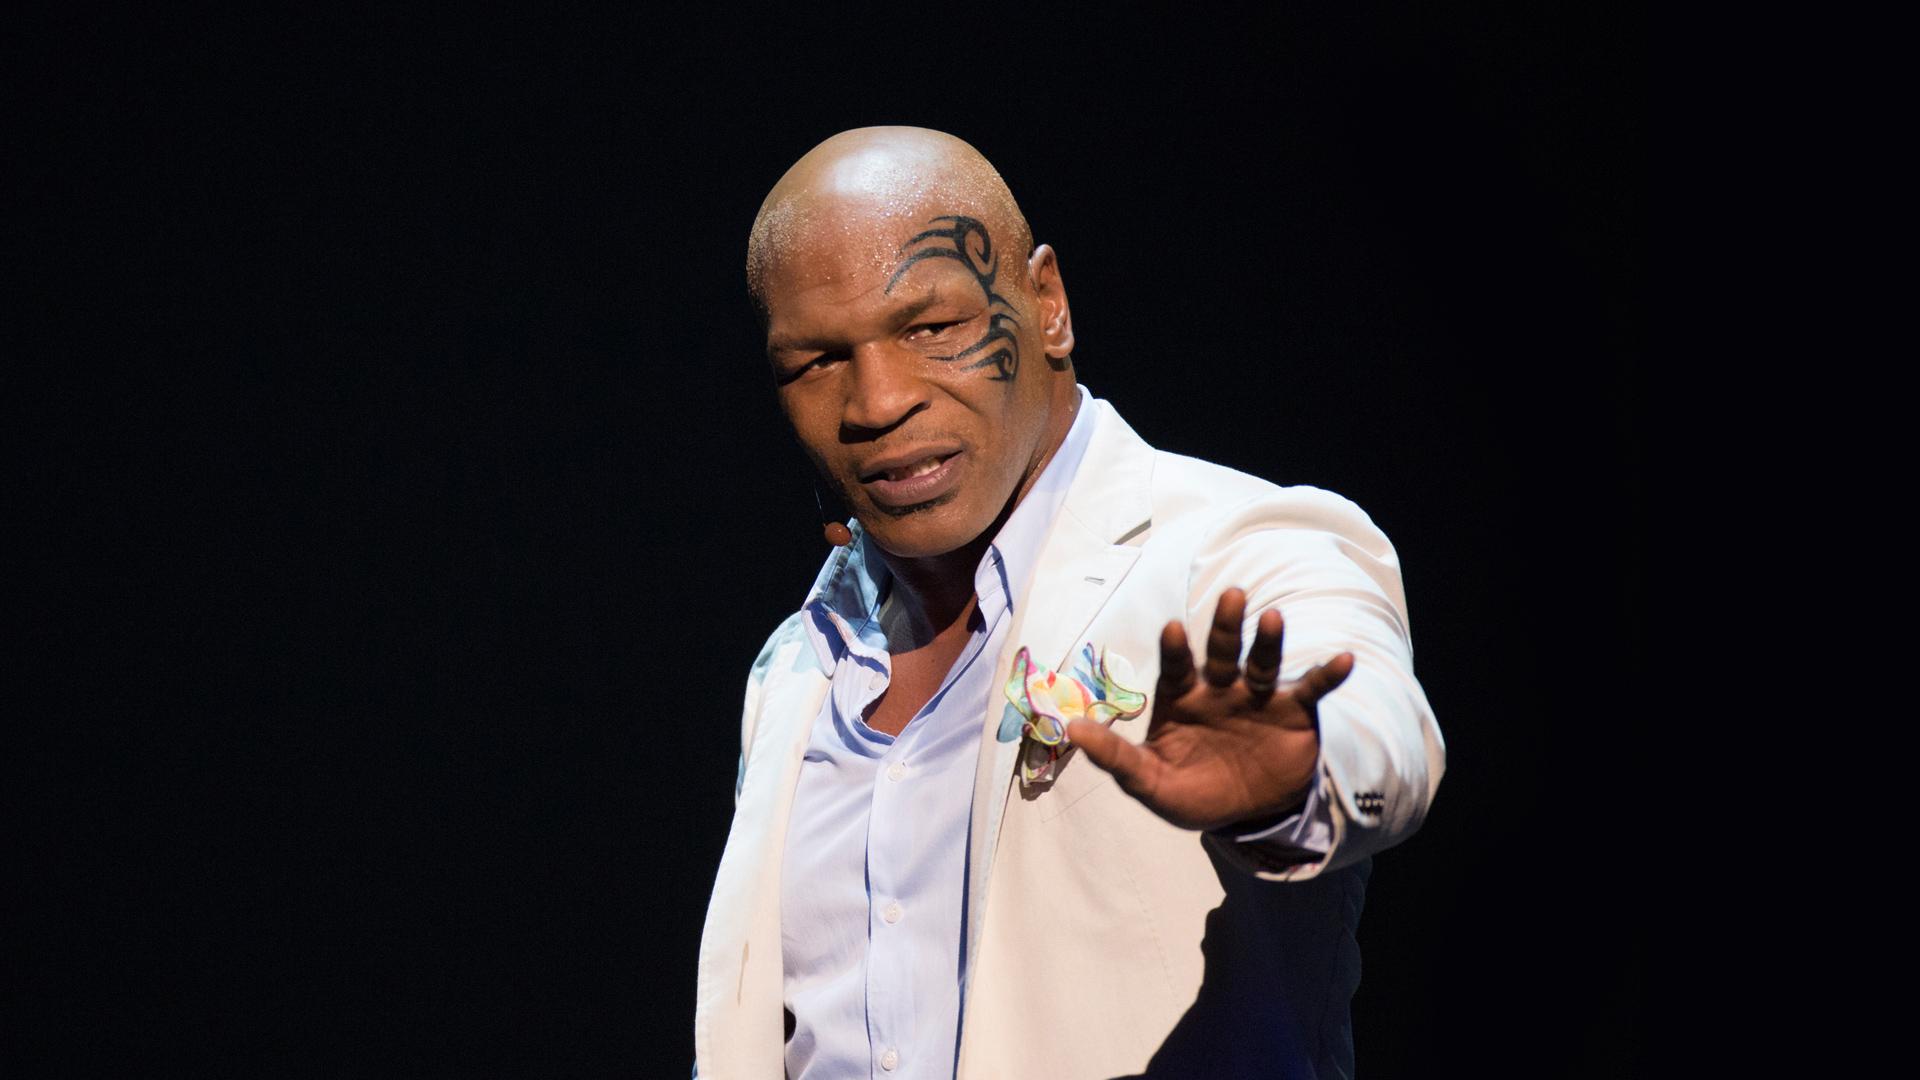 Mike Tyson annihilated Trevor Berbick